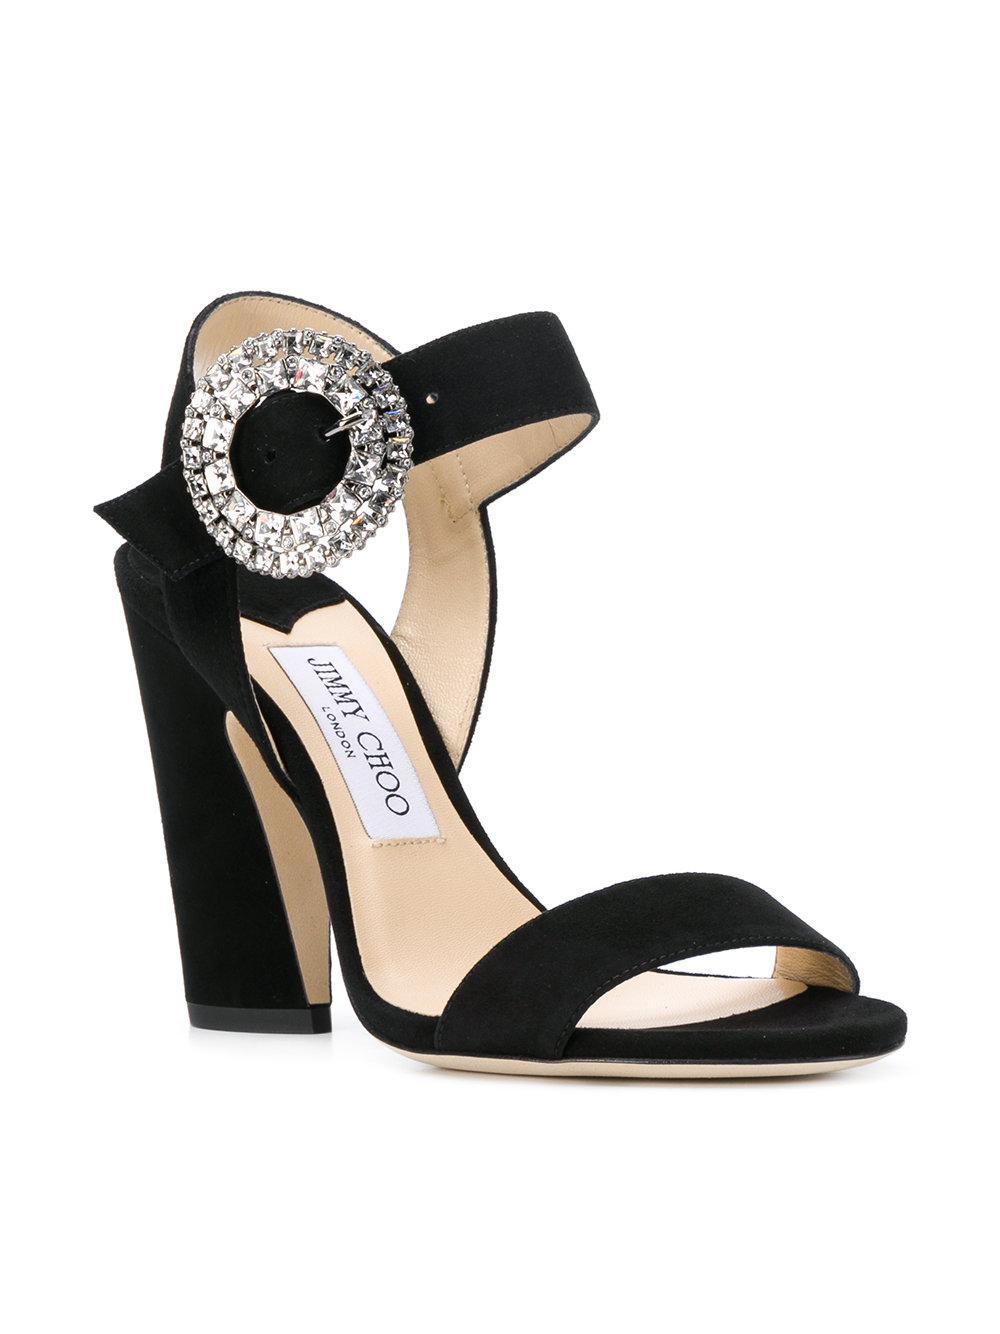 1ec0ca2ea5 Jimmy Choo Mischa 100 Sandals in Black - Lyst